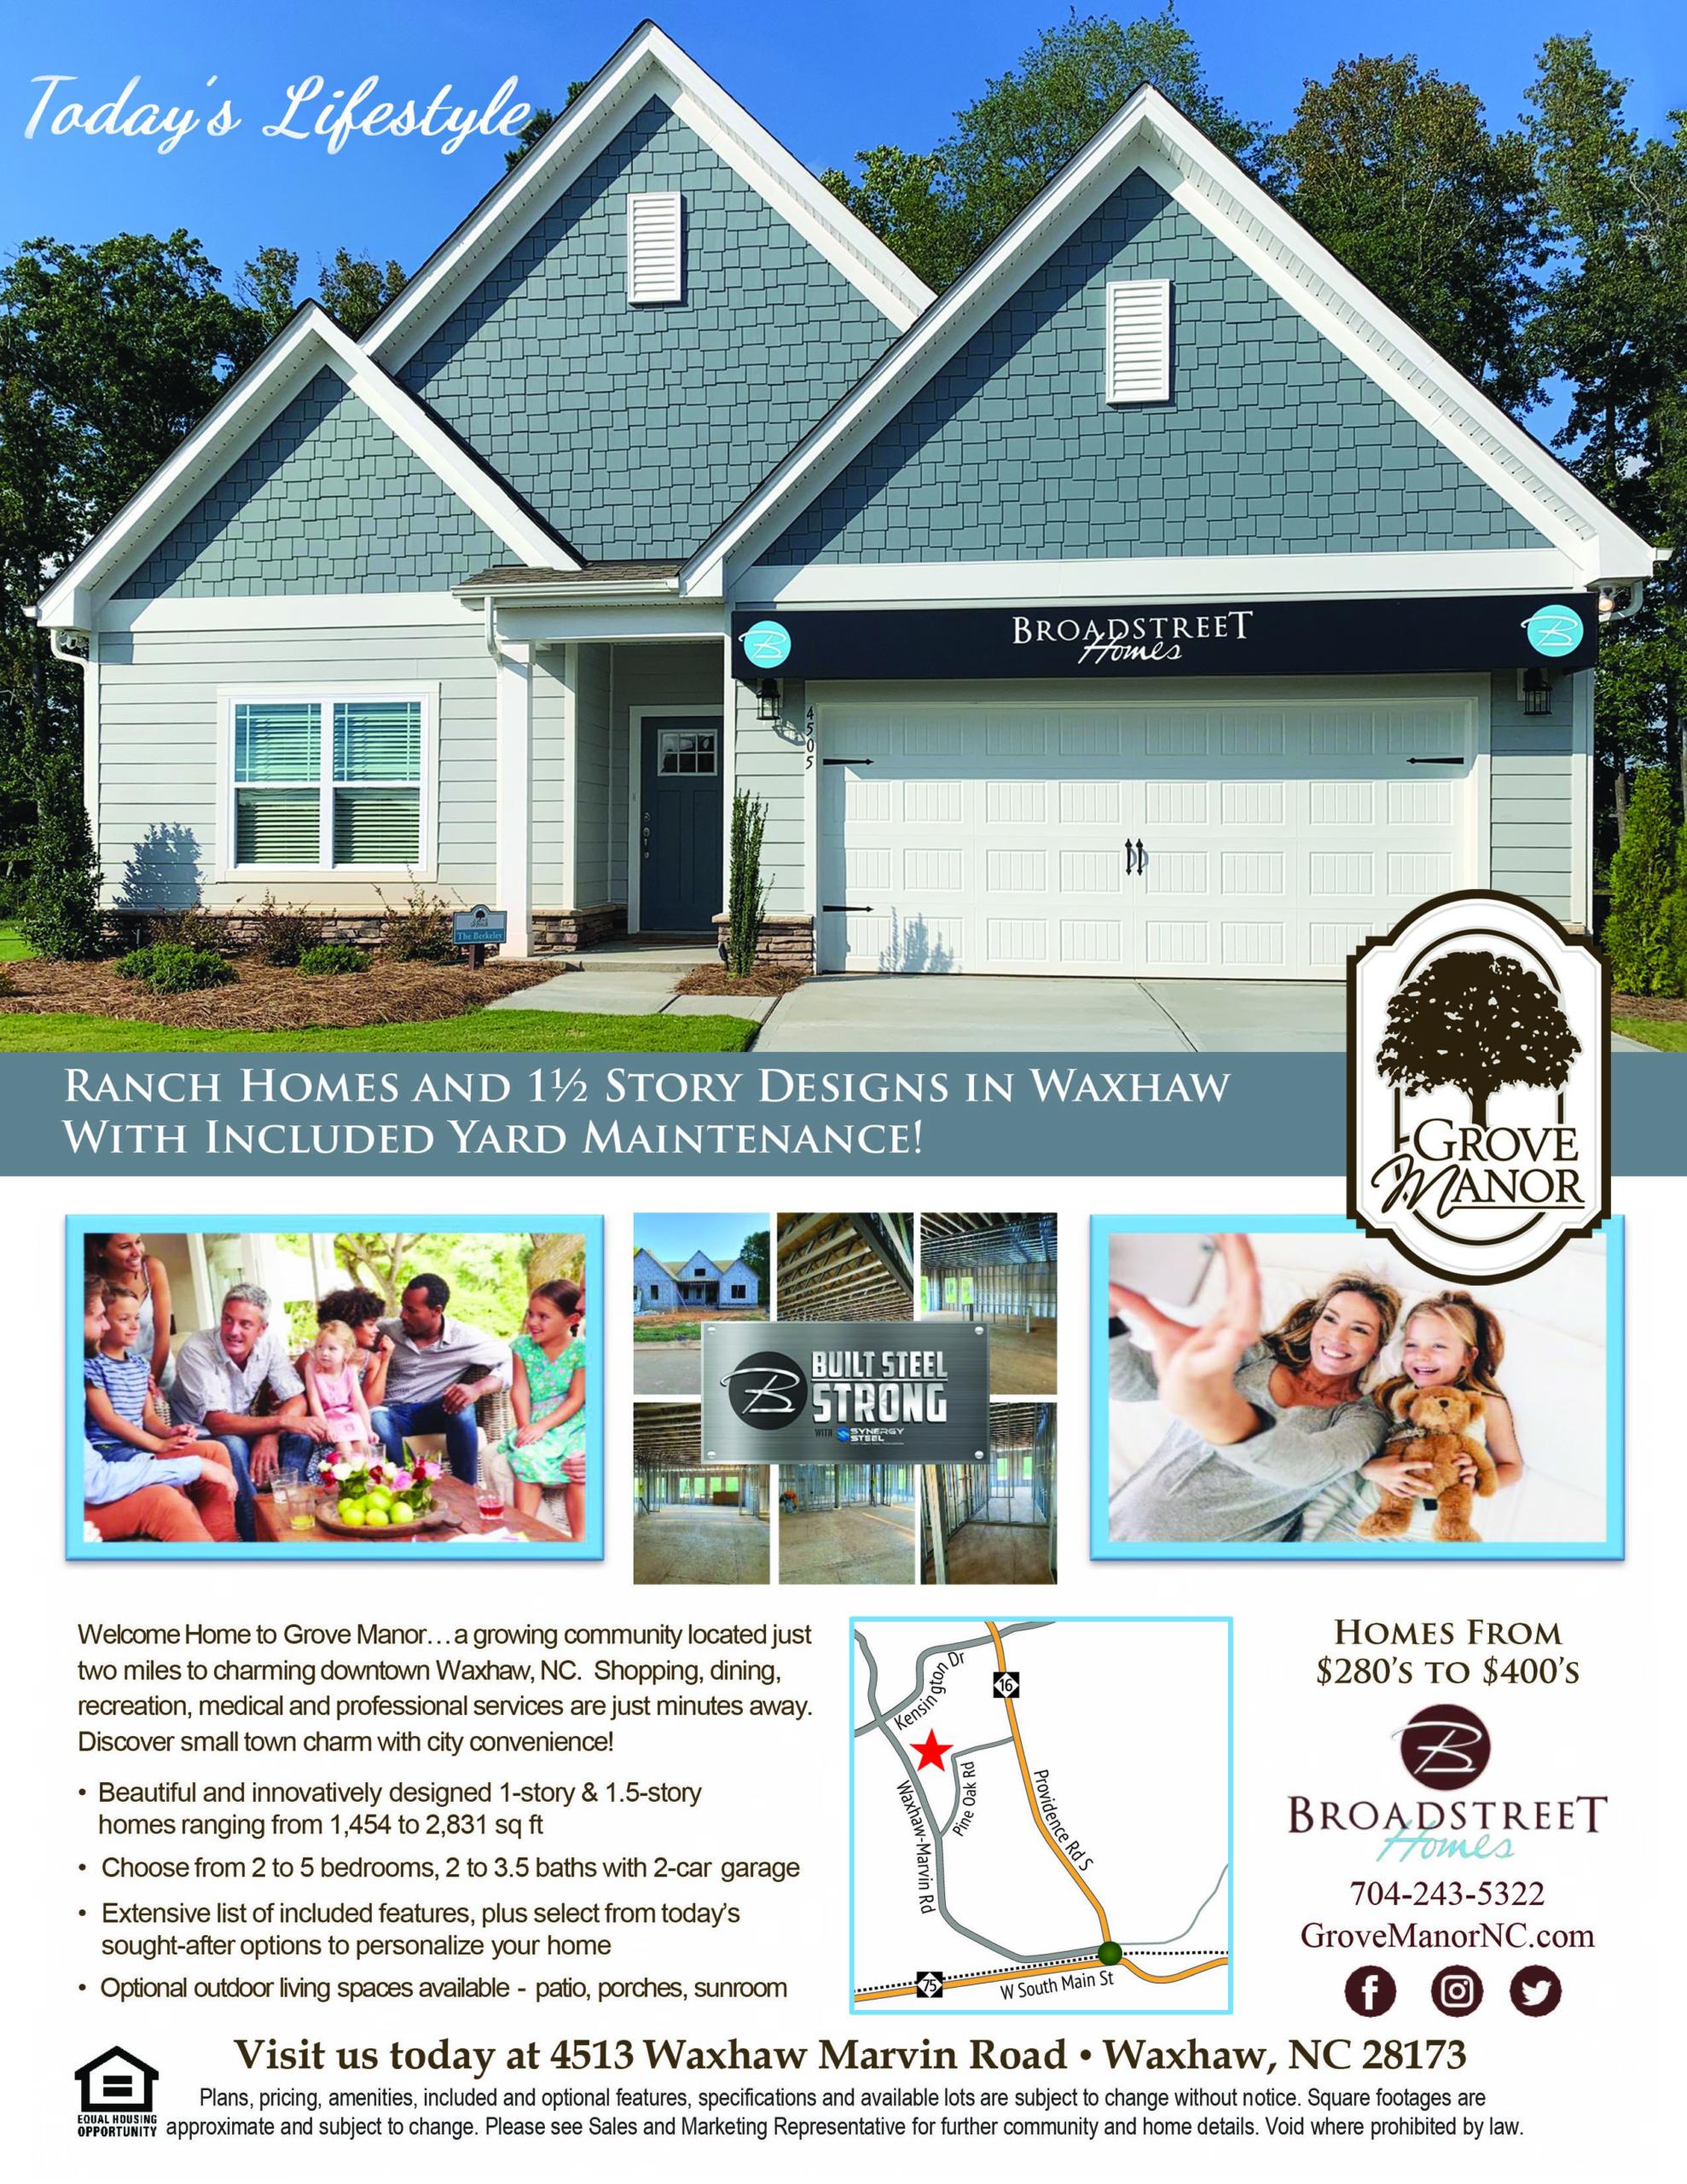 Broadstreet Homes & Grove Manor